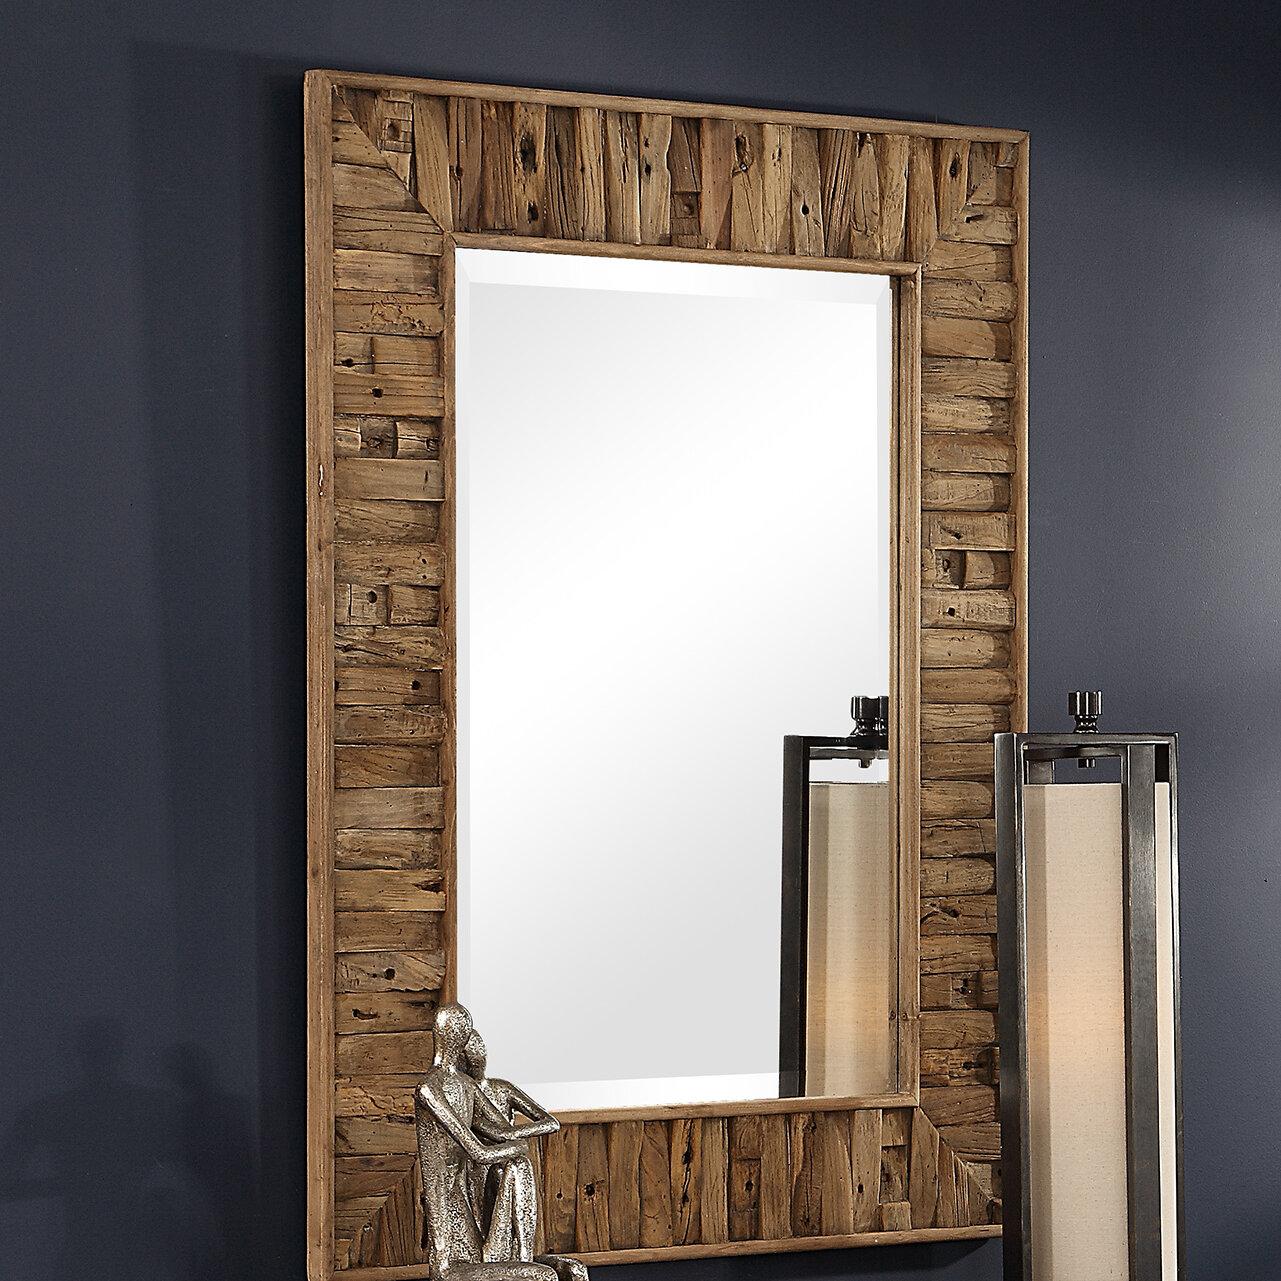 Oneybrook Reclaimed Wood Rustic Beveled Accent Mirror Birch Lane